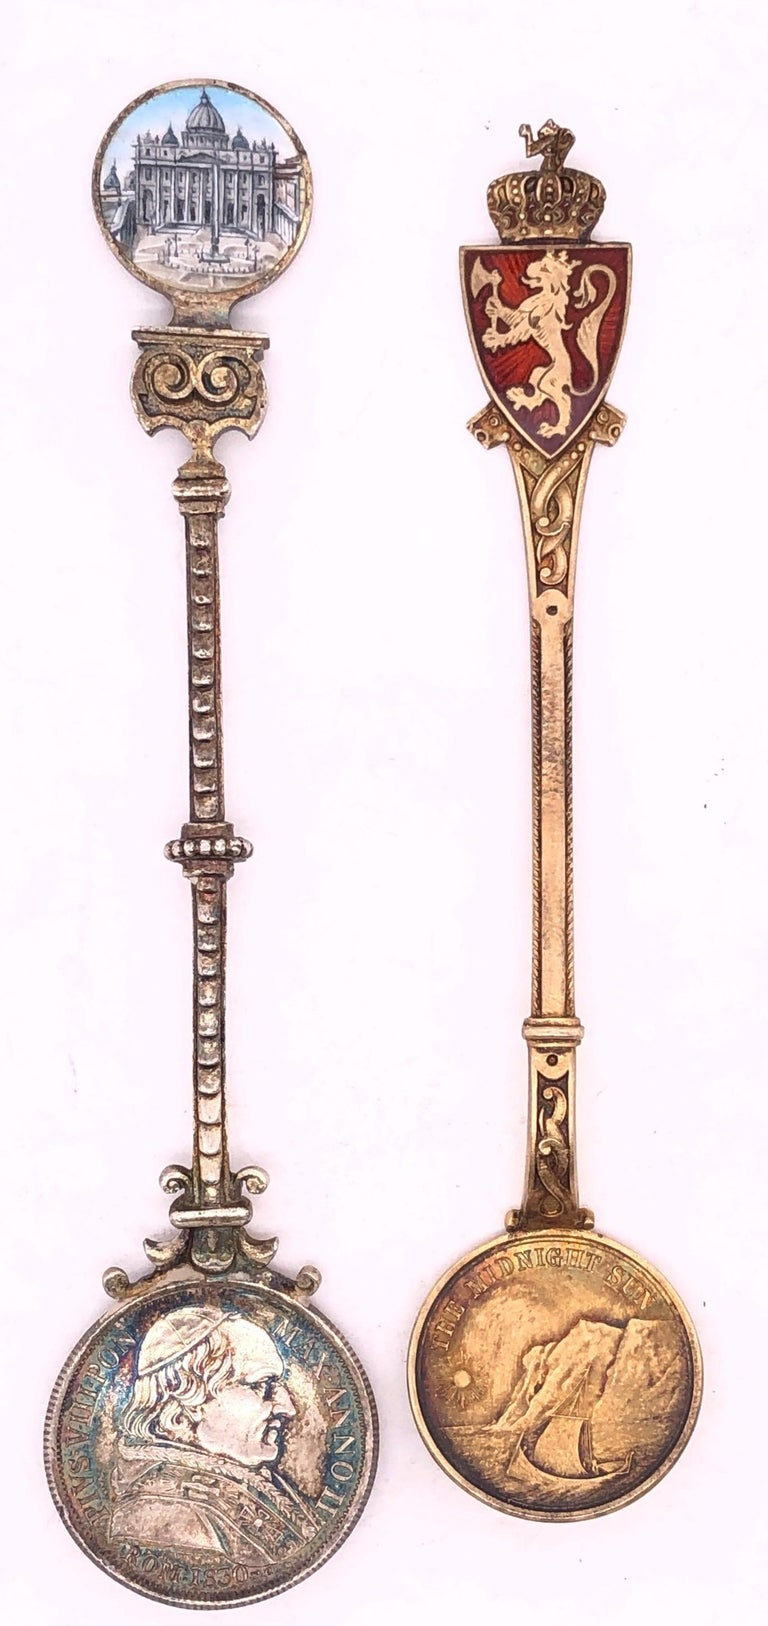 925 Sterling Silver Souvenir Medallion Spoon. David Anderson Sterling Silver